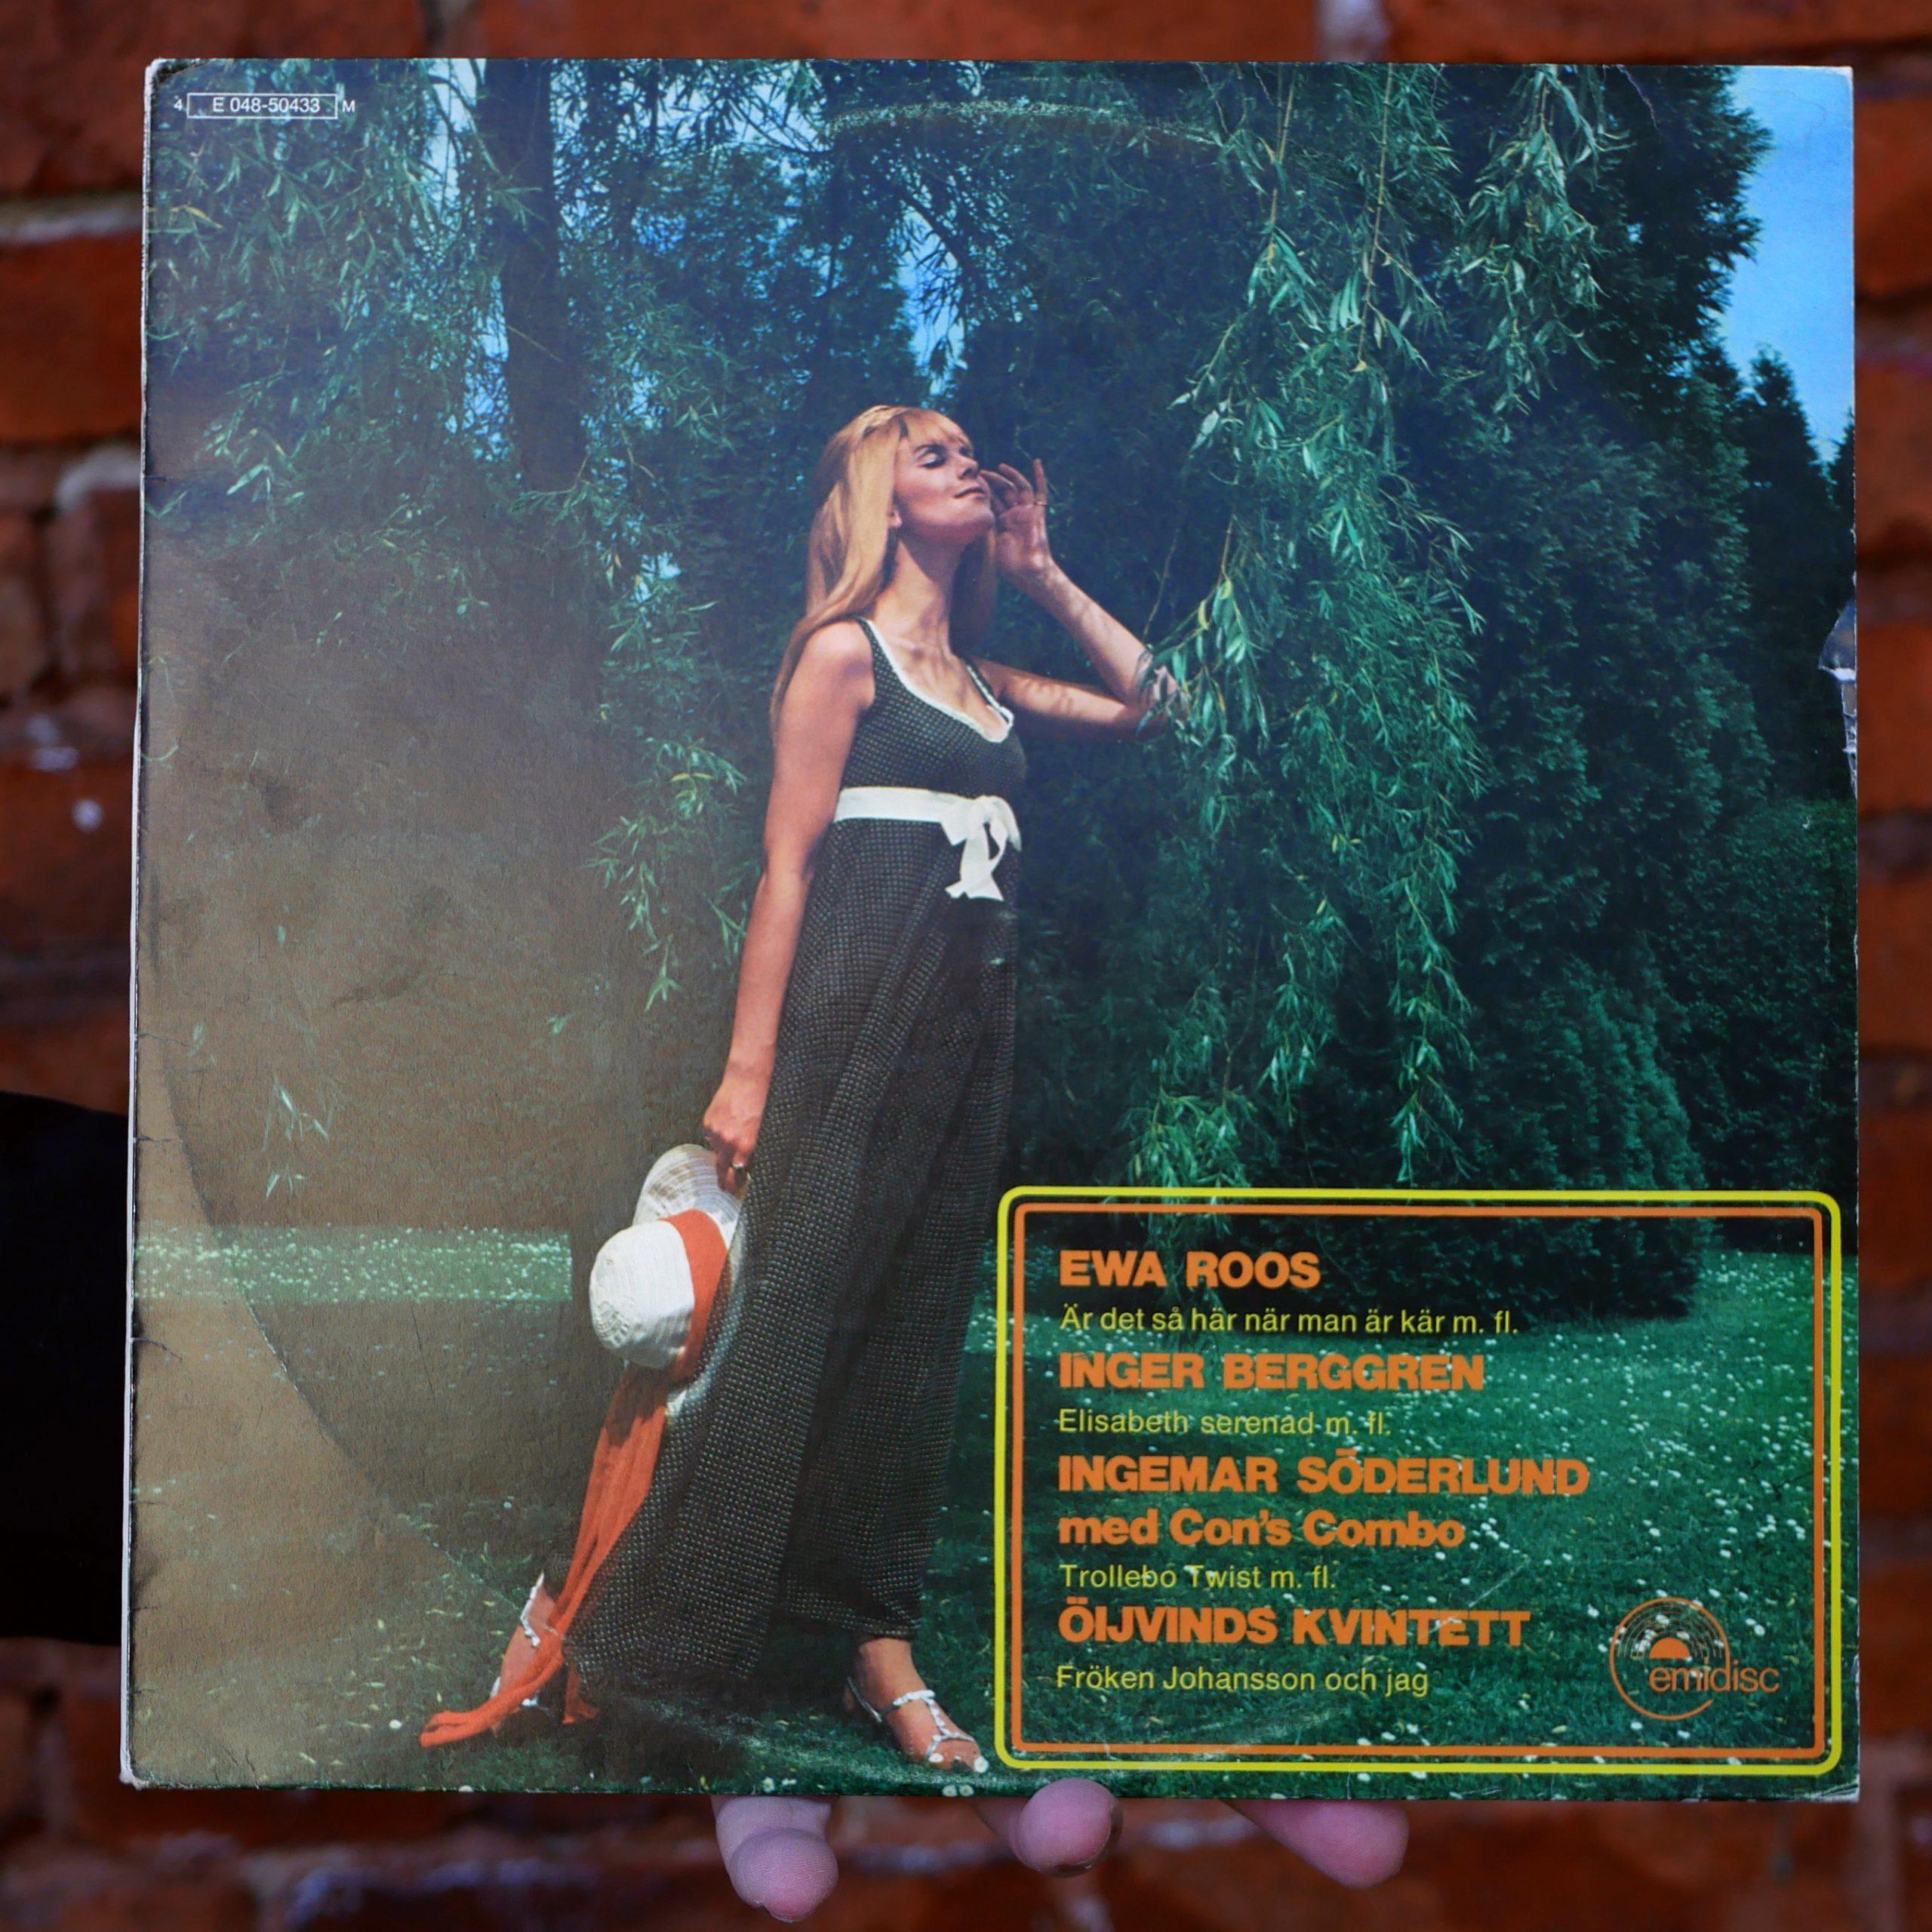 Diverse artister –Ewa Roos, Inger Berggren, Ingemar Söderlund med Con's Combo, Öijvinds kvintett [LP, 1971]